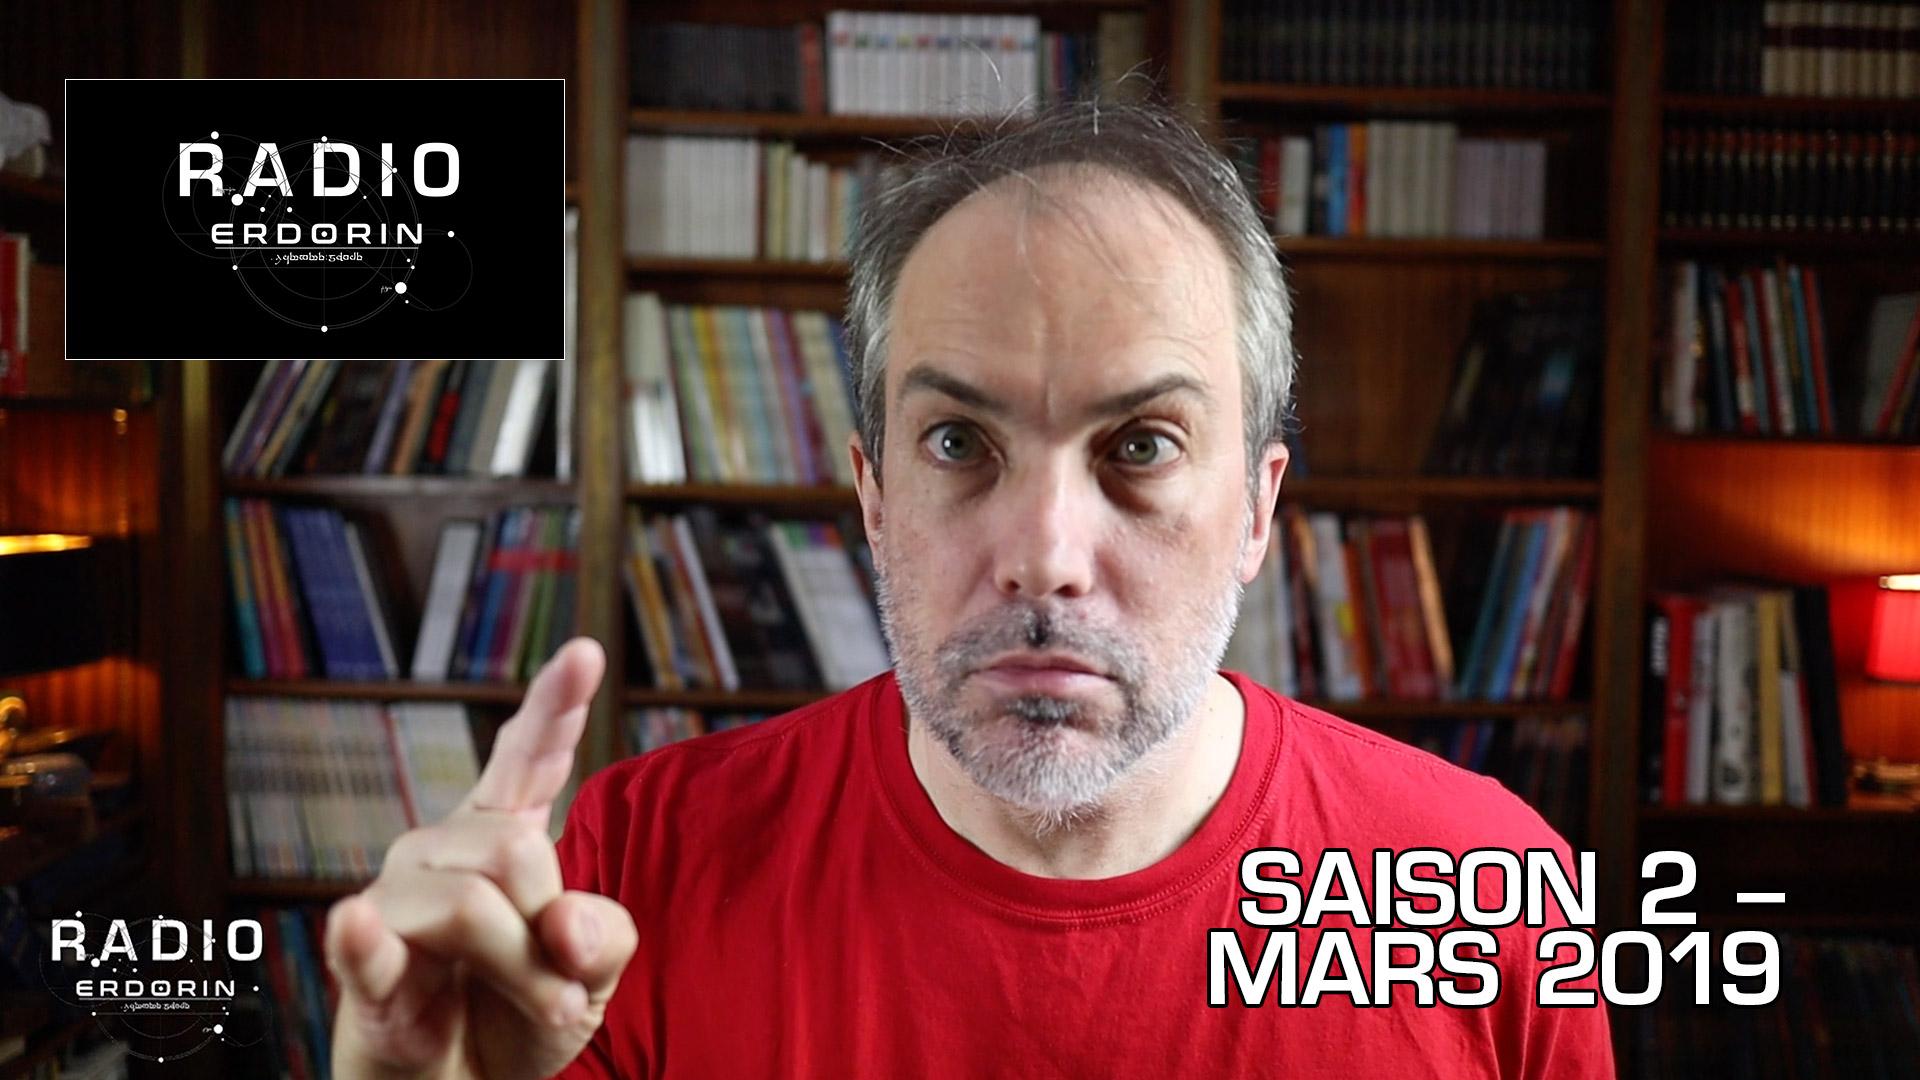 Radio-Erdorin S2E3 - Mars 2019